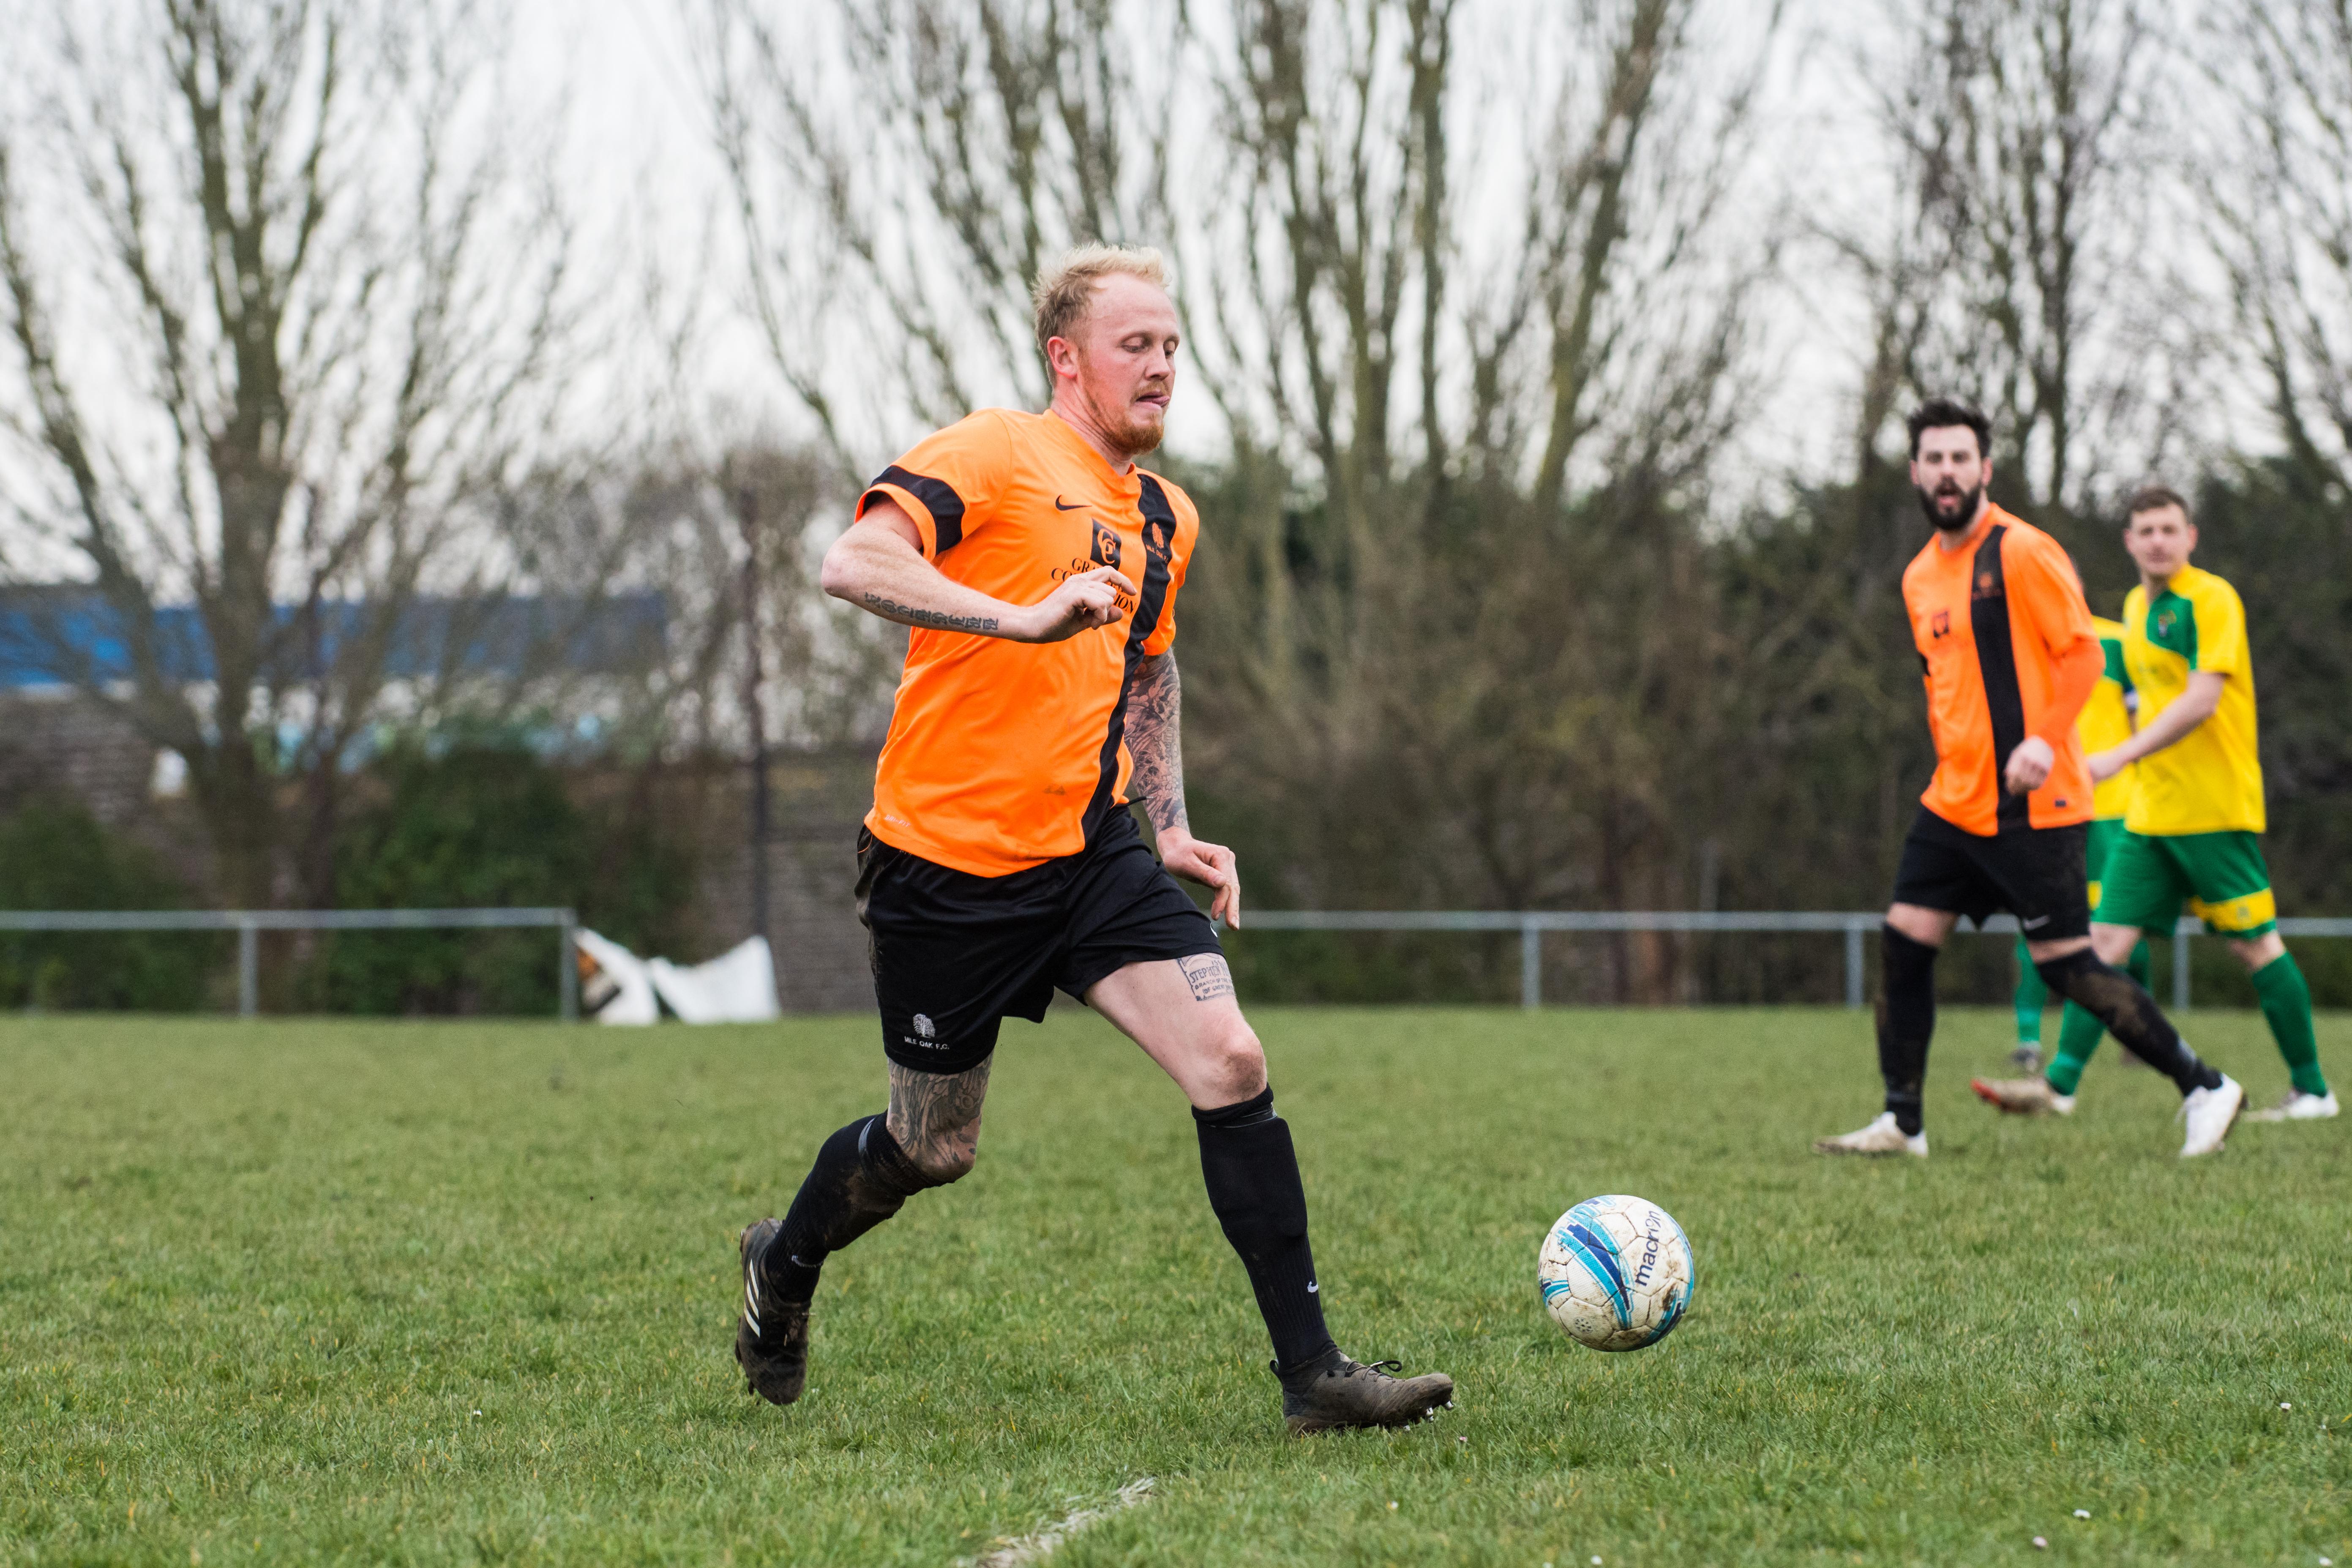 DAVID_JEFFERY Mile Oak FC vs Hailsham Town FC 24.03.18 49